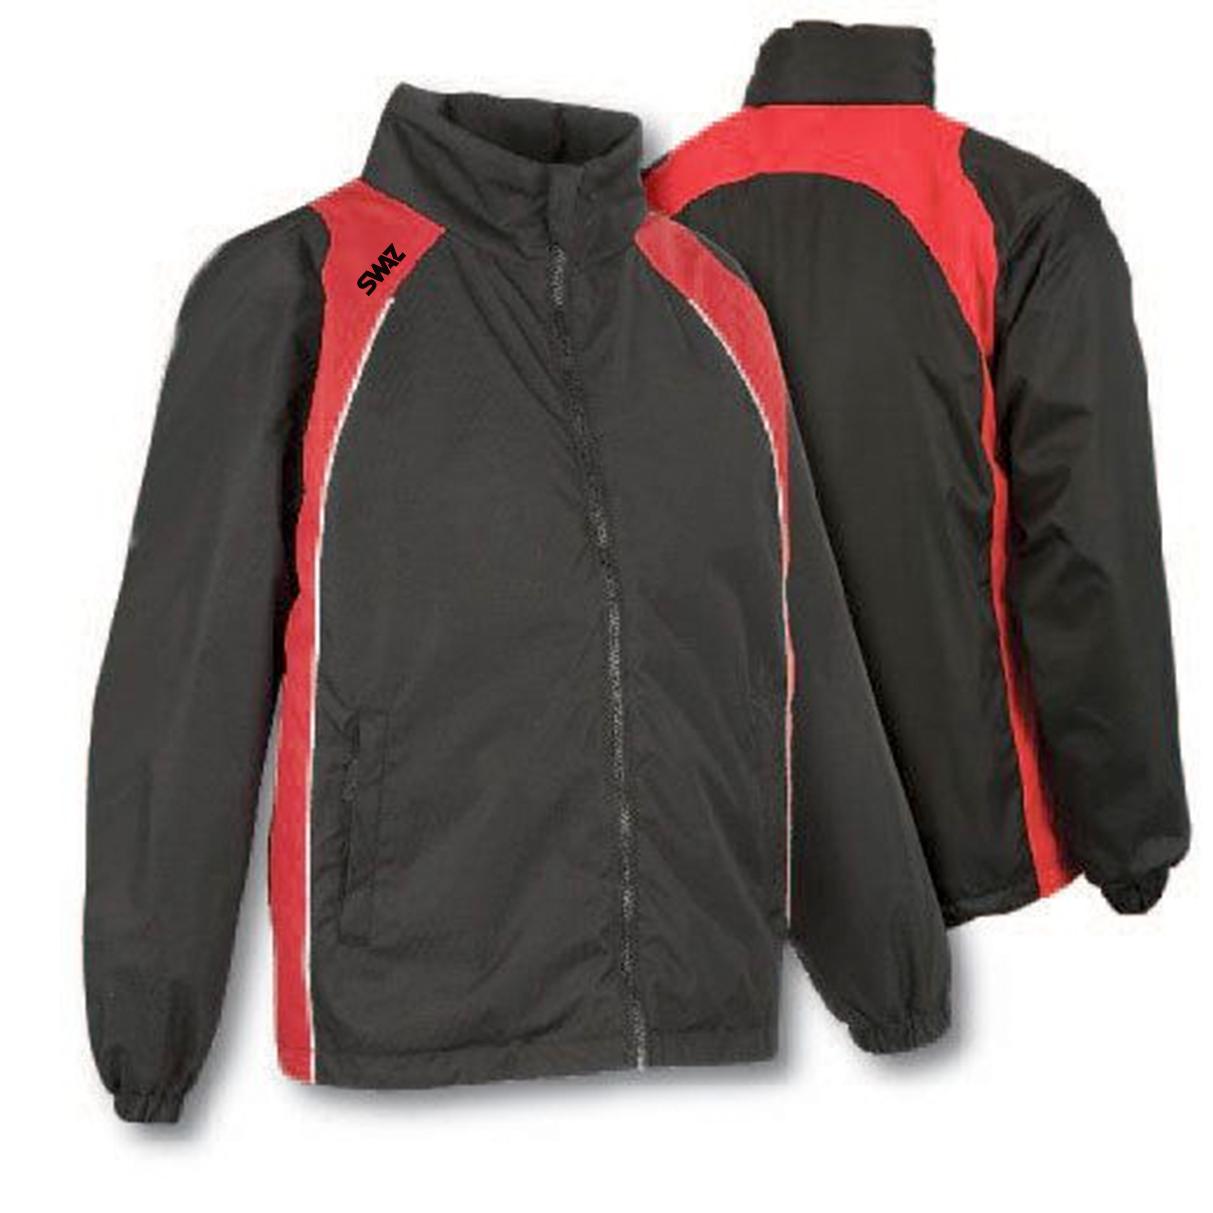 15 SWAZ Showerproof Jackets – Black/Red